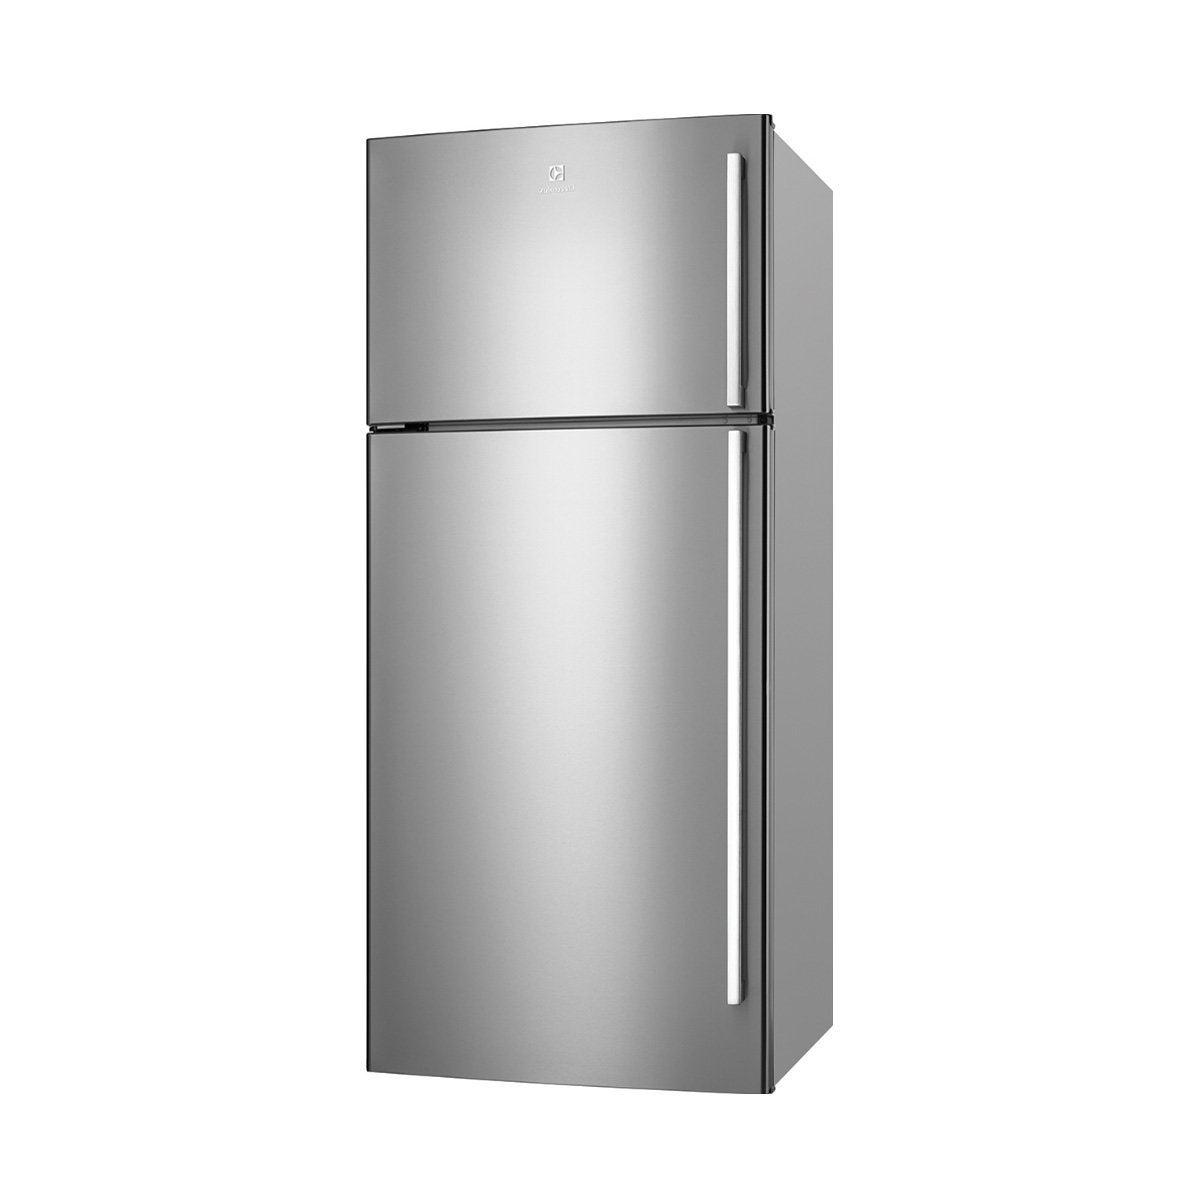 Electrolux ETM4200SDLH Refrigerator